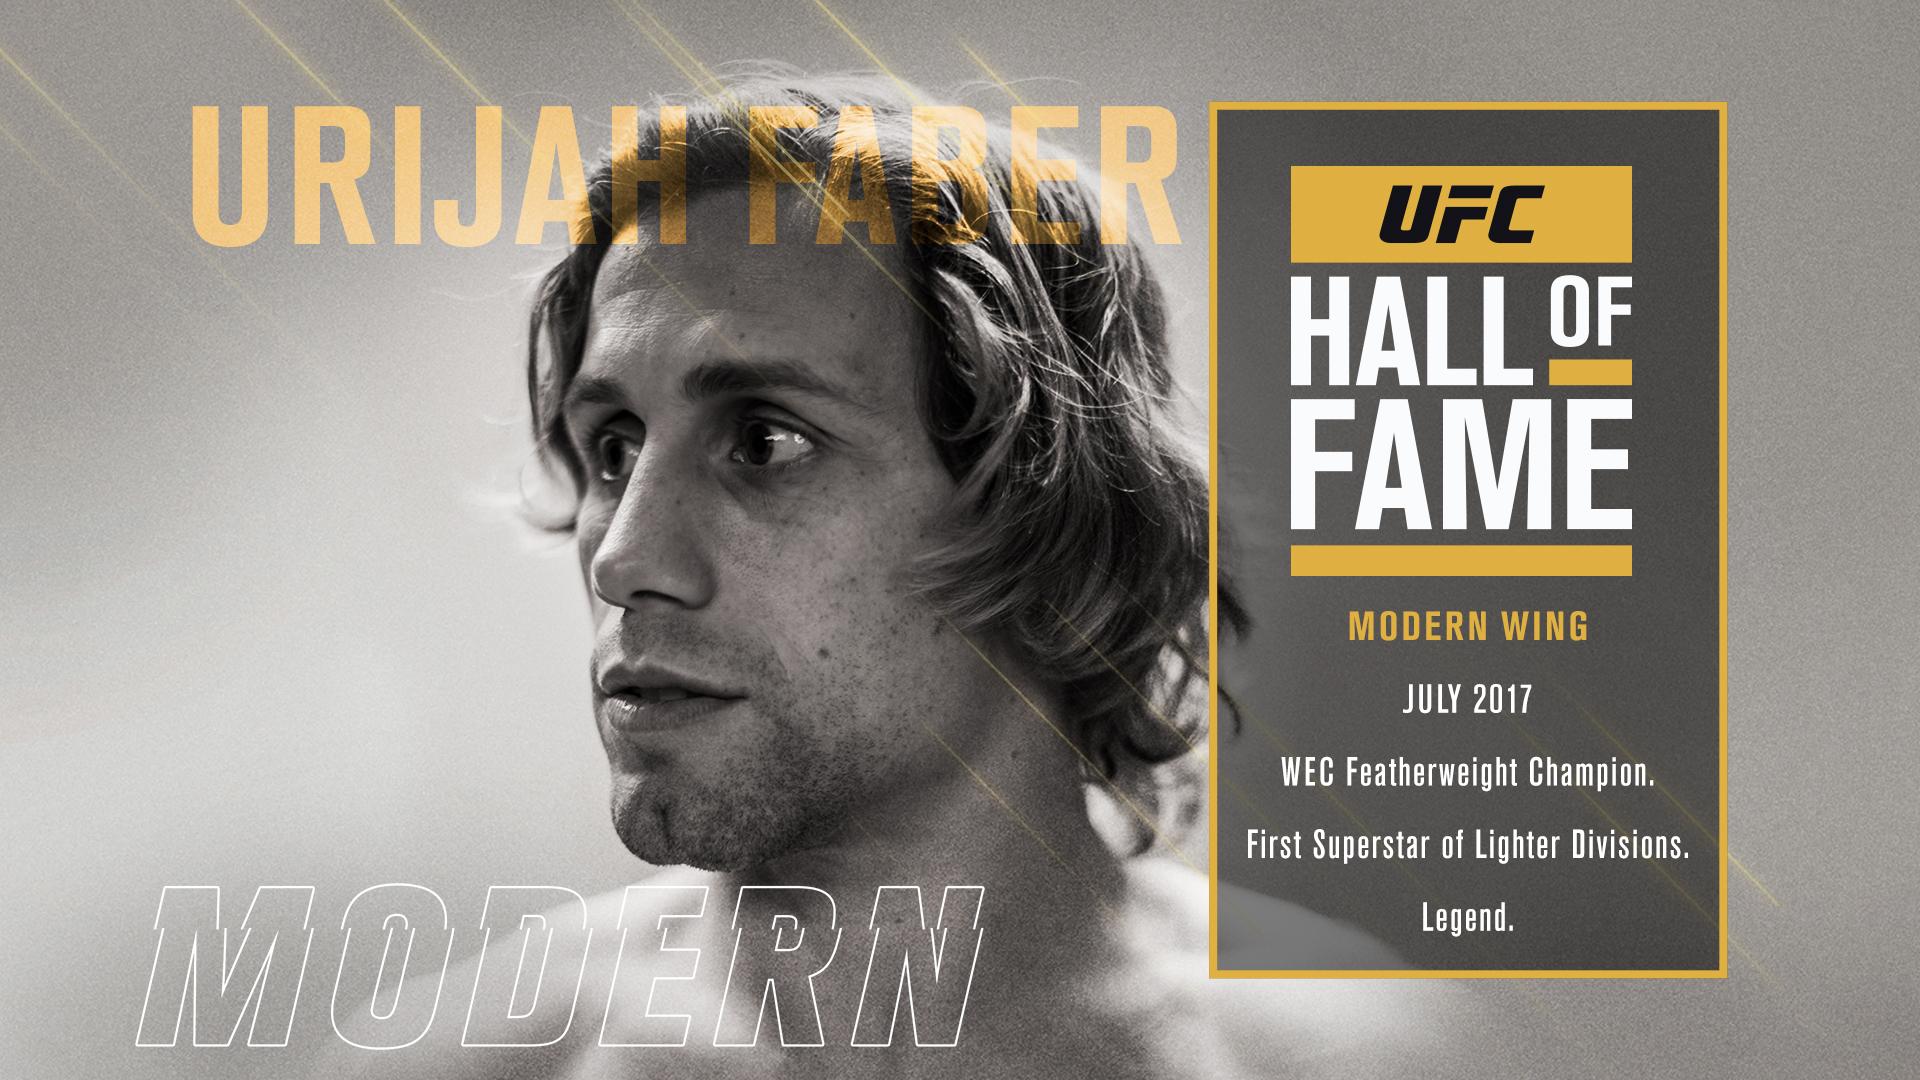 2017 UFC Hall of Fame class Urijah Faber Modern Wing